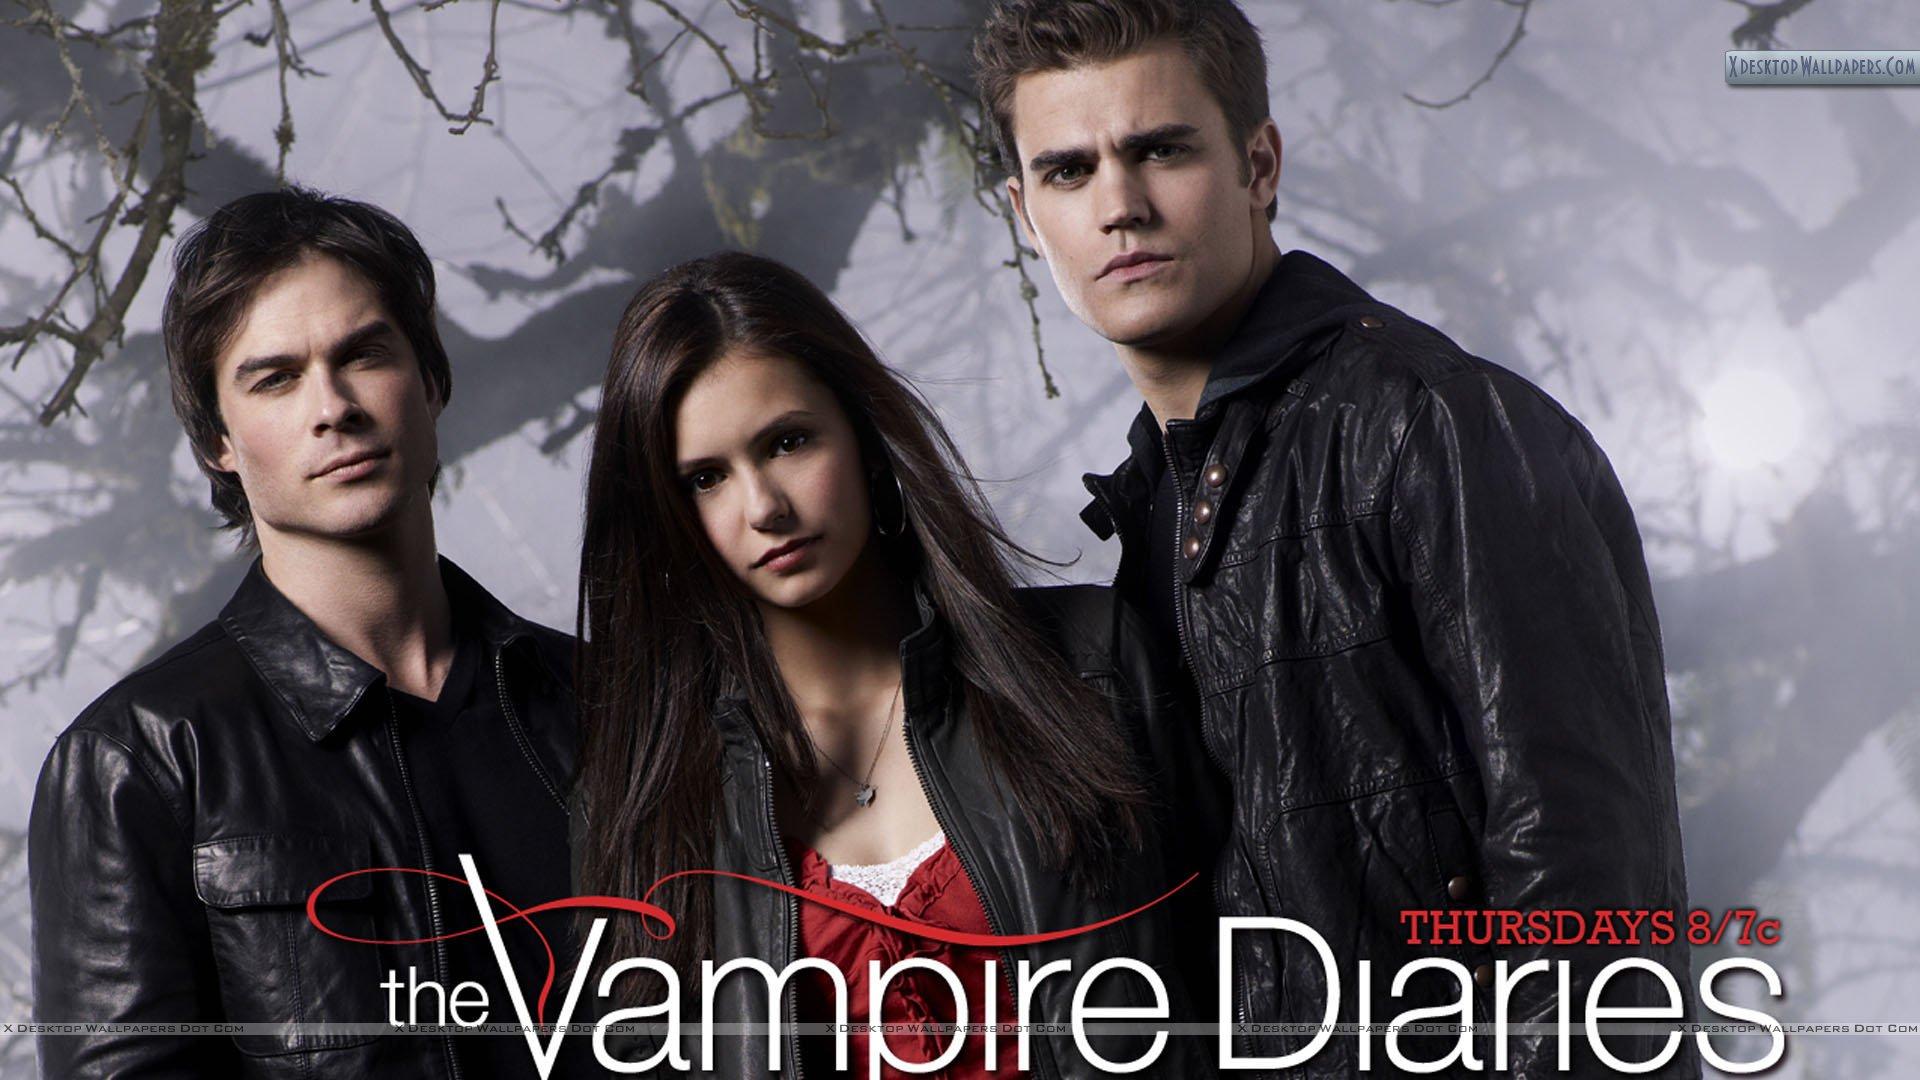 The Vampire Diaries Damon Elena And Stefan Wallpaper 1920x1080